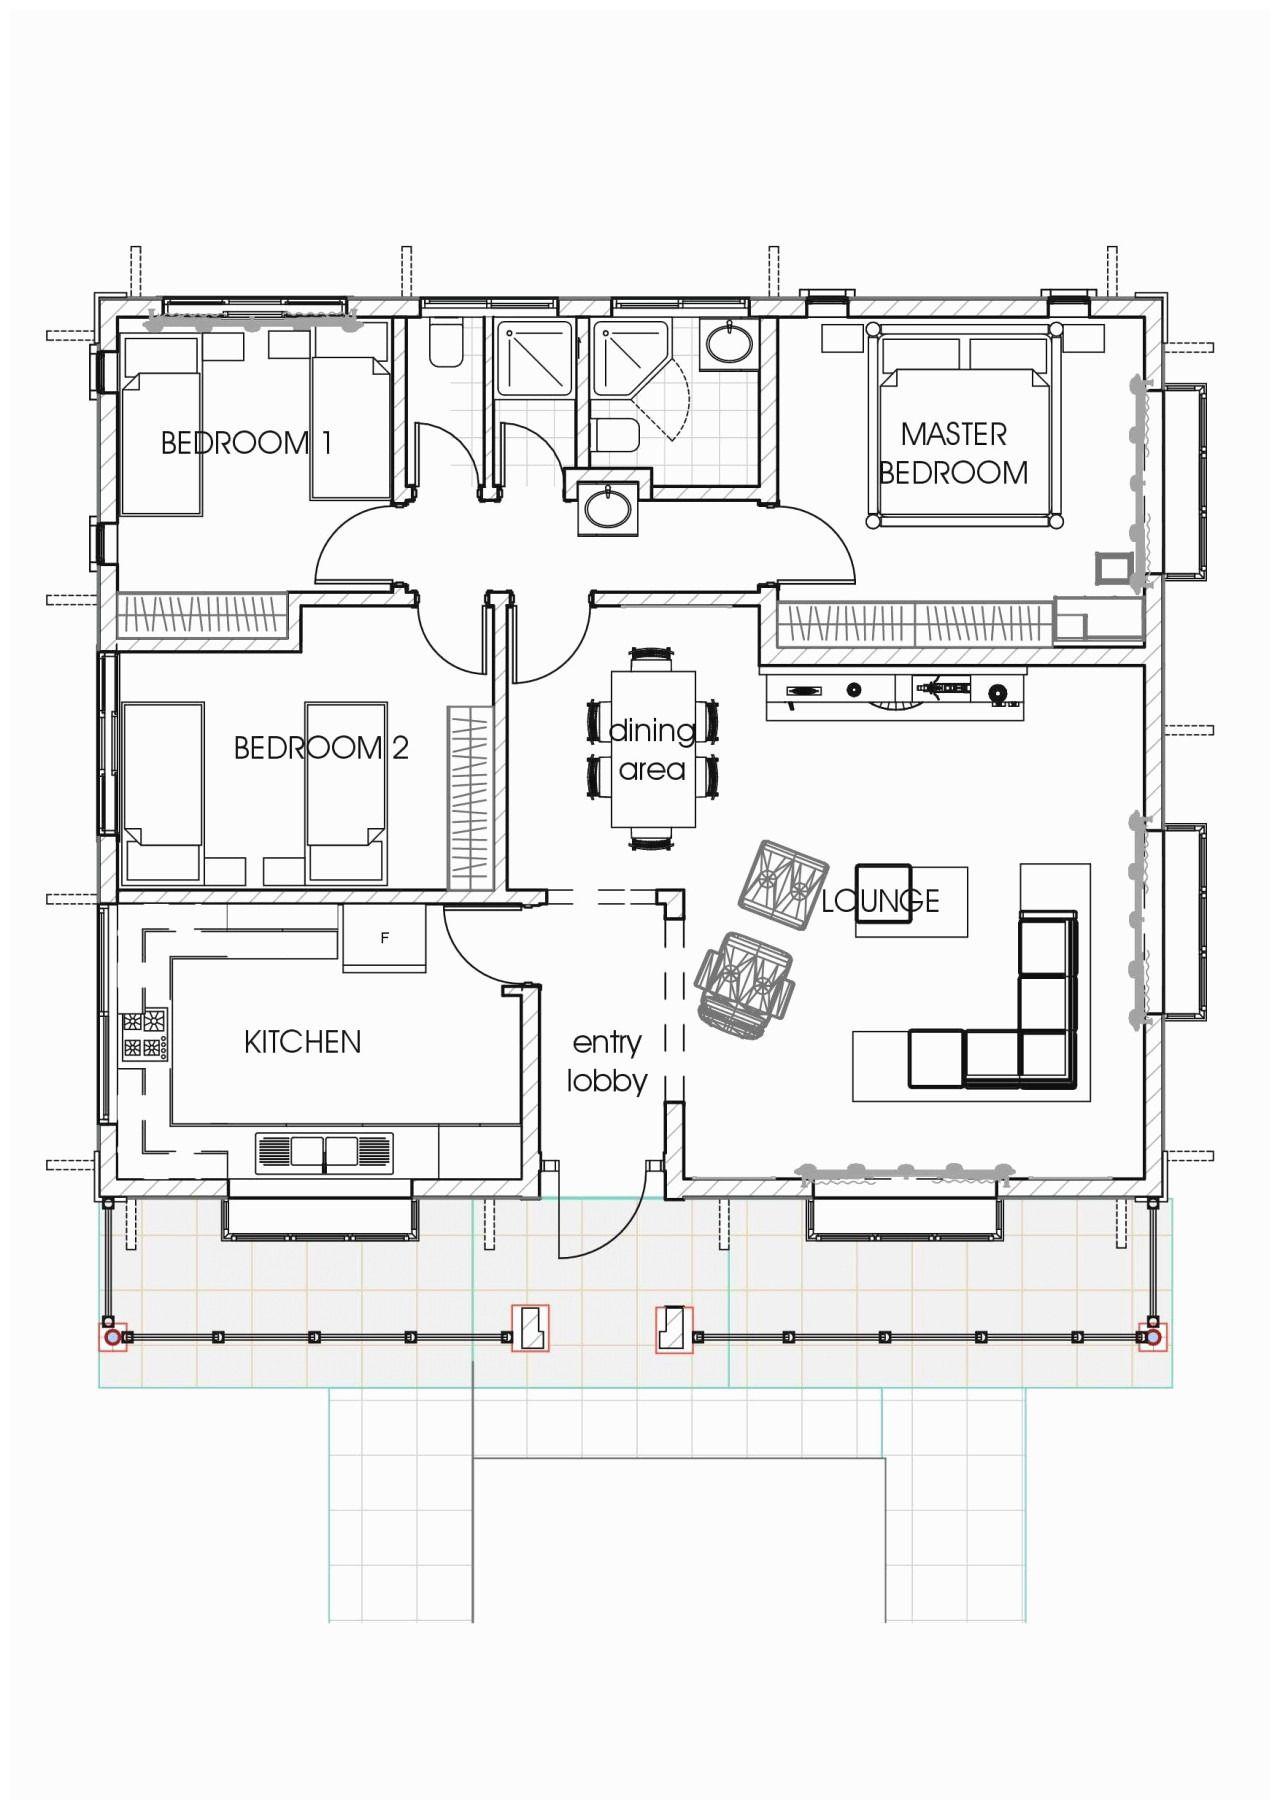 Three Bedroom Floor Plan In Nigeria  Three bedroom house plan